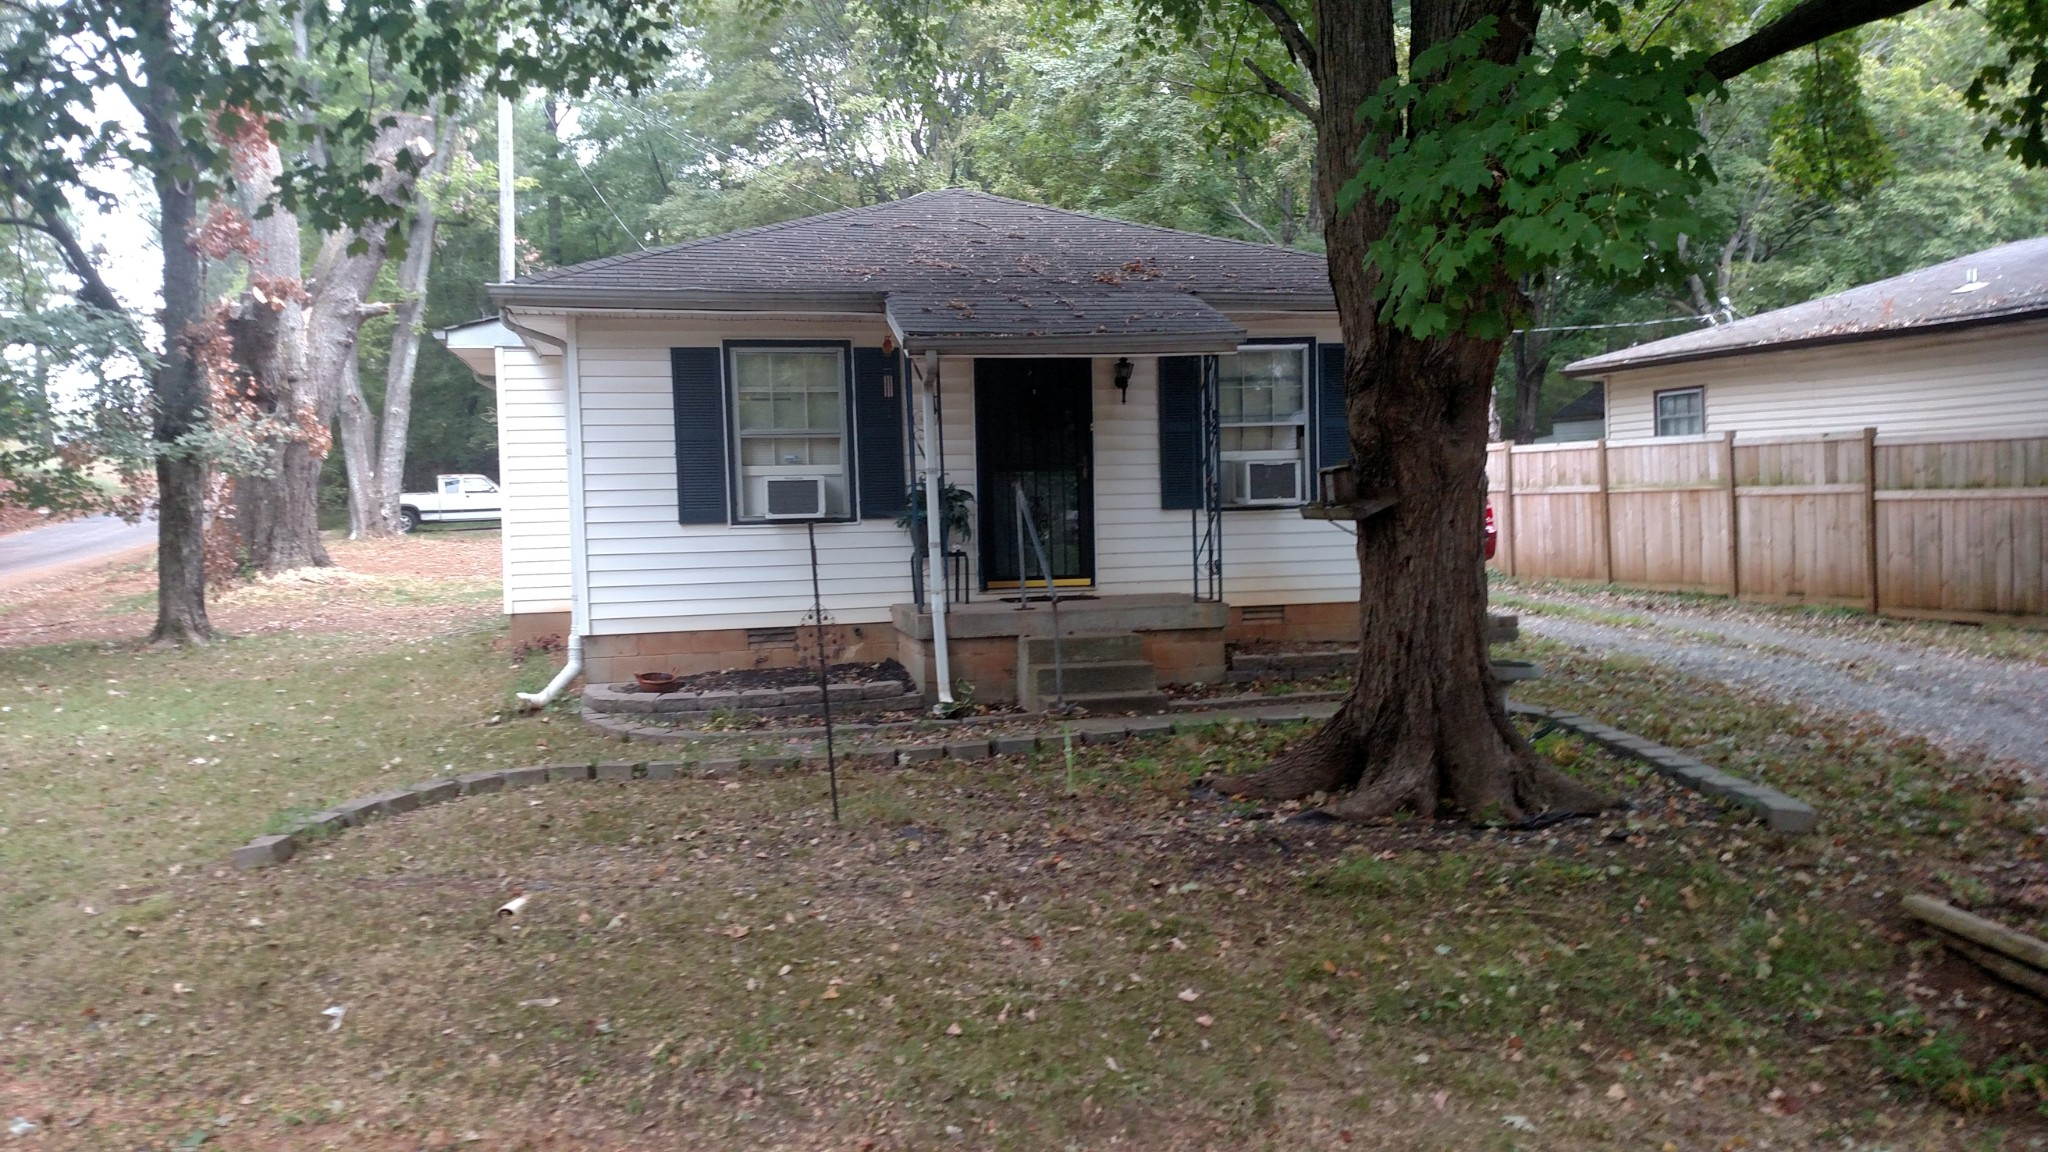 145 W Rossview Rd, Clarksville, TN 37040 - Clarksville, TN real estate listing